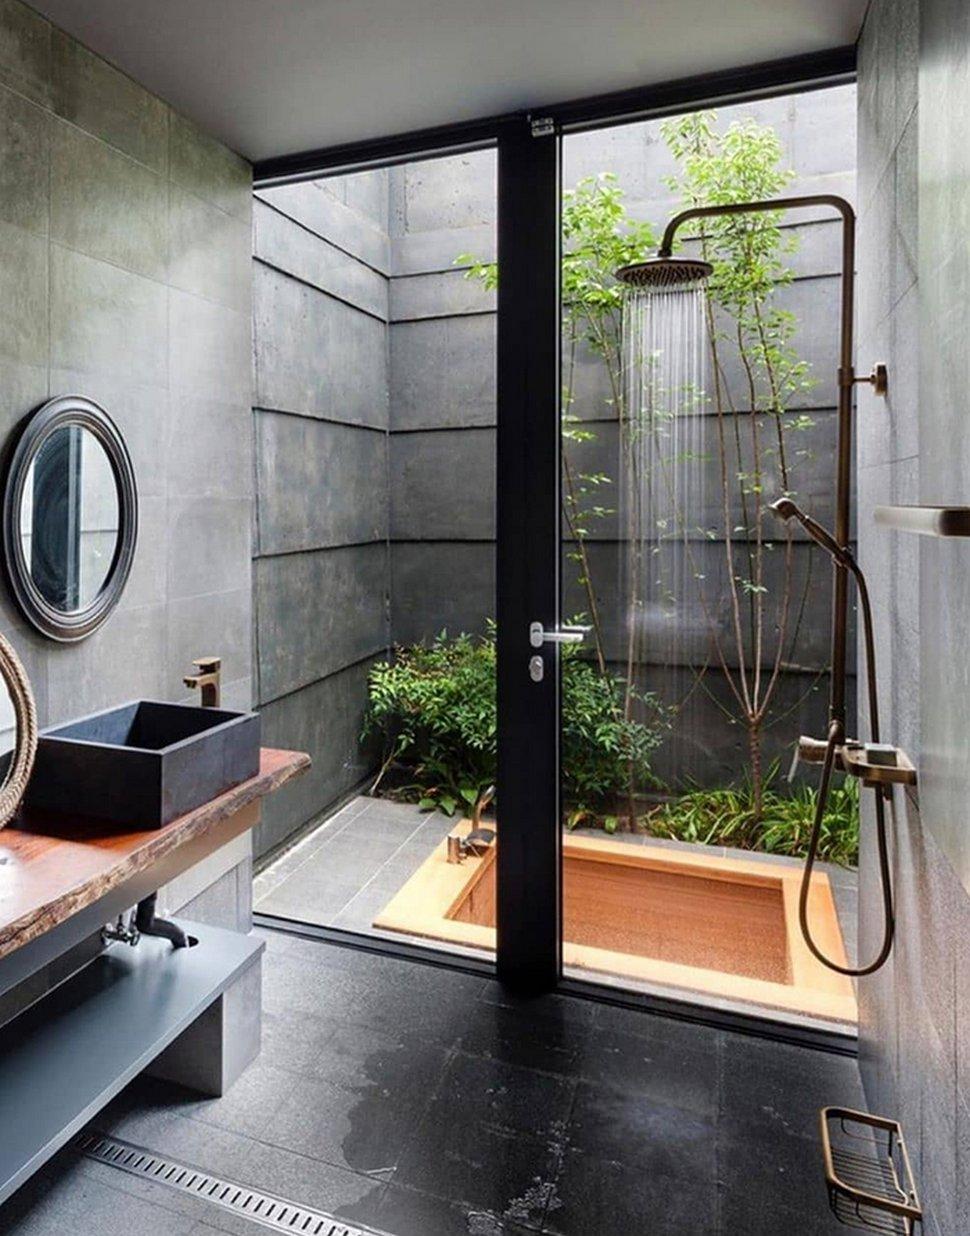 22 exemples incroyables de design moderne